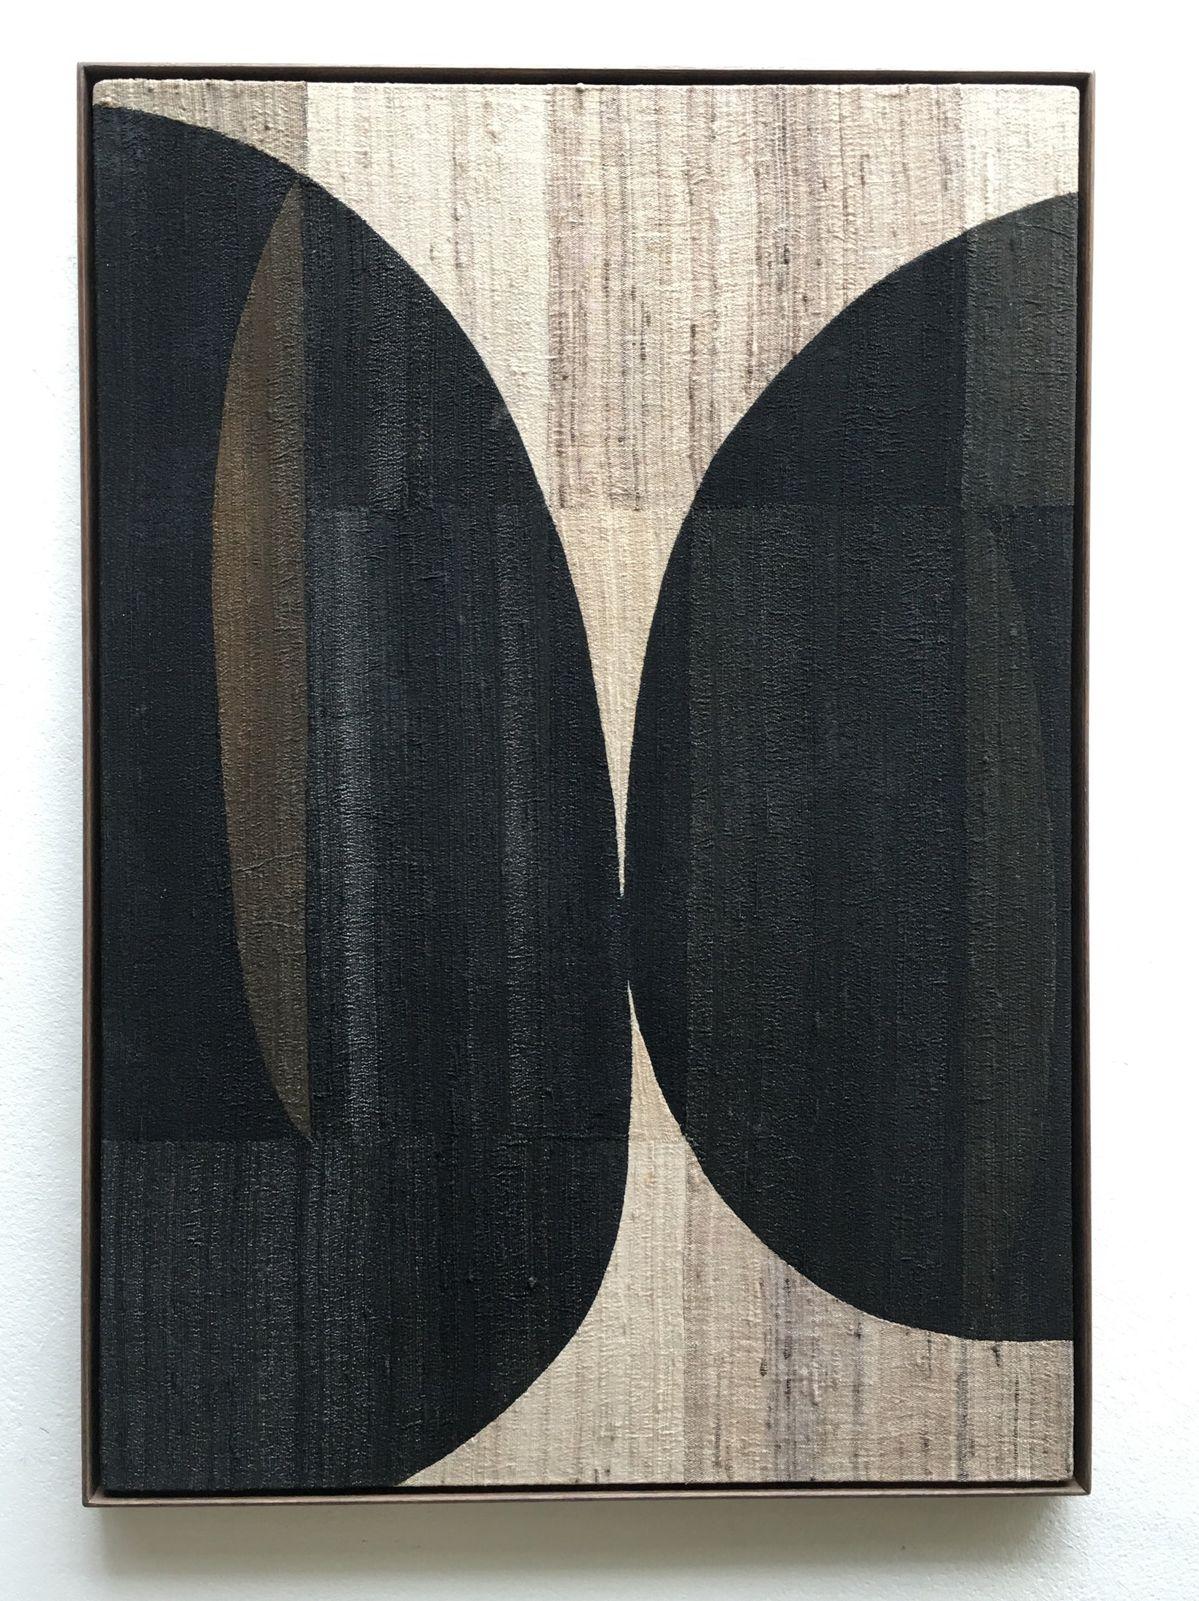 handwoven individually dyed silk on wooden panelhardwood framesize 62 x 43 cm